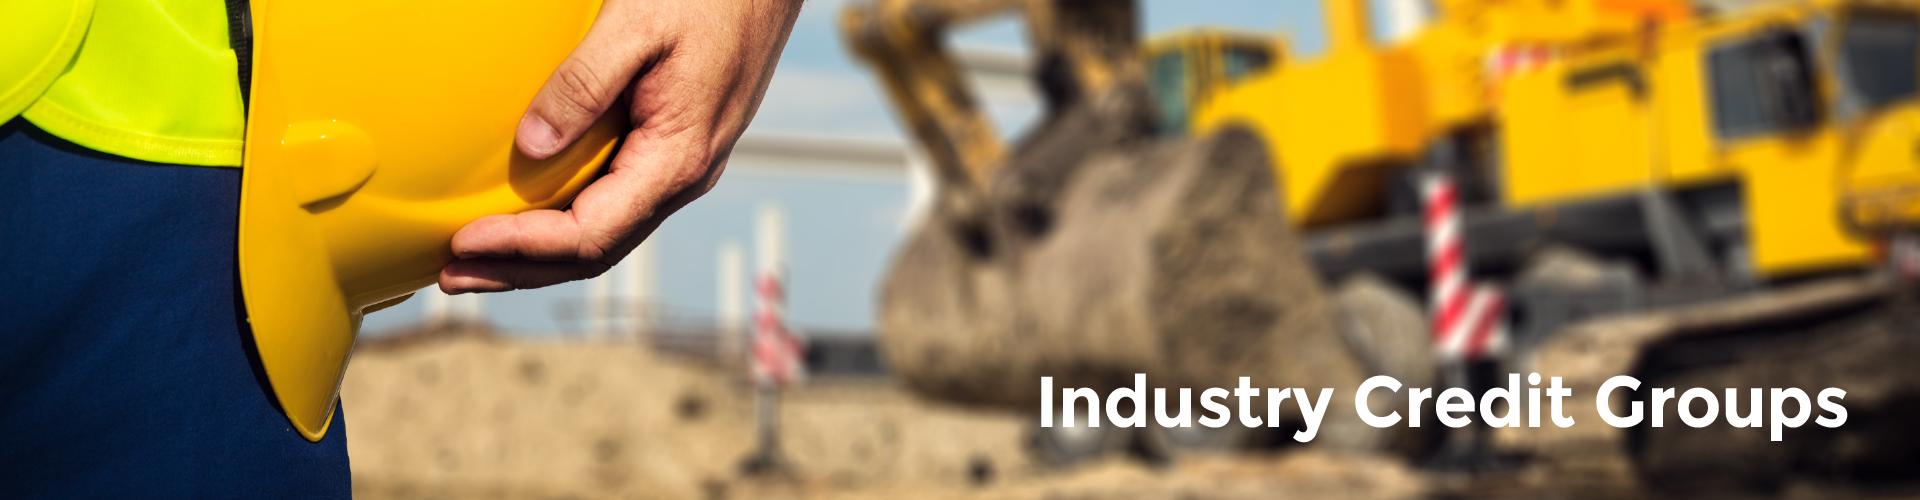 industry_SLIDER_1920x500_secondary